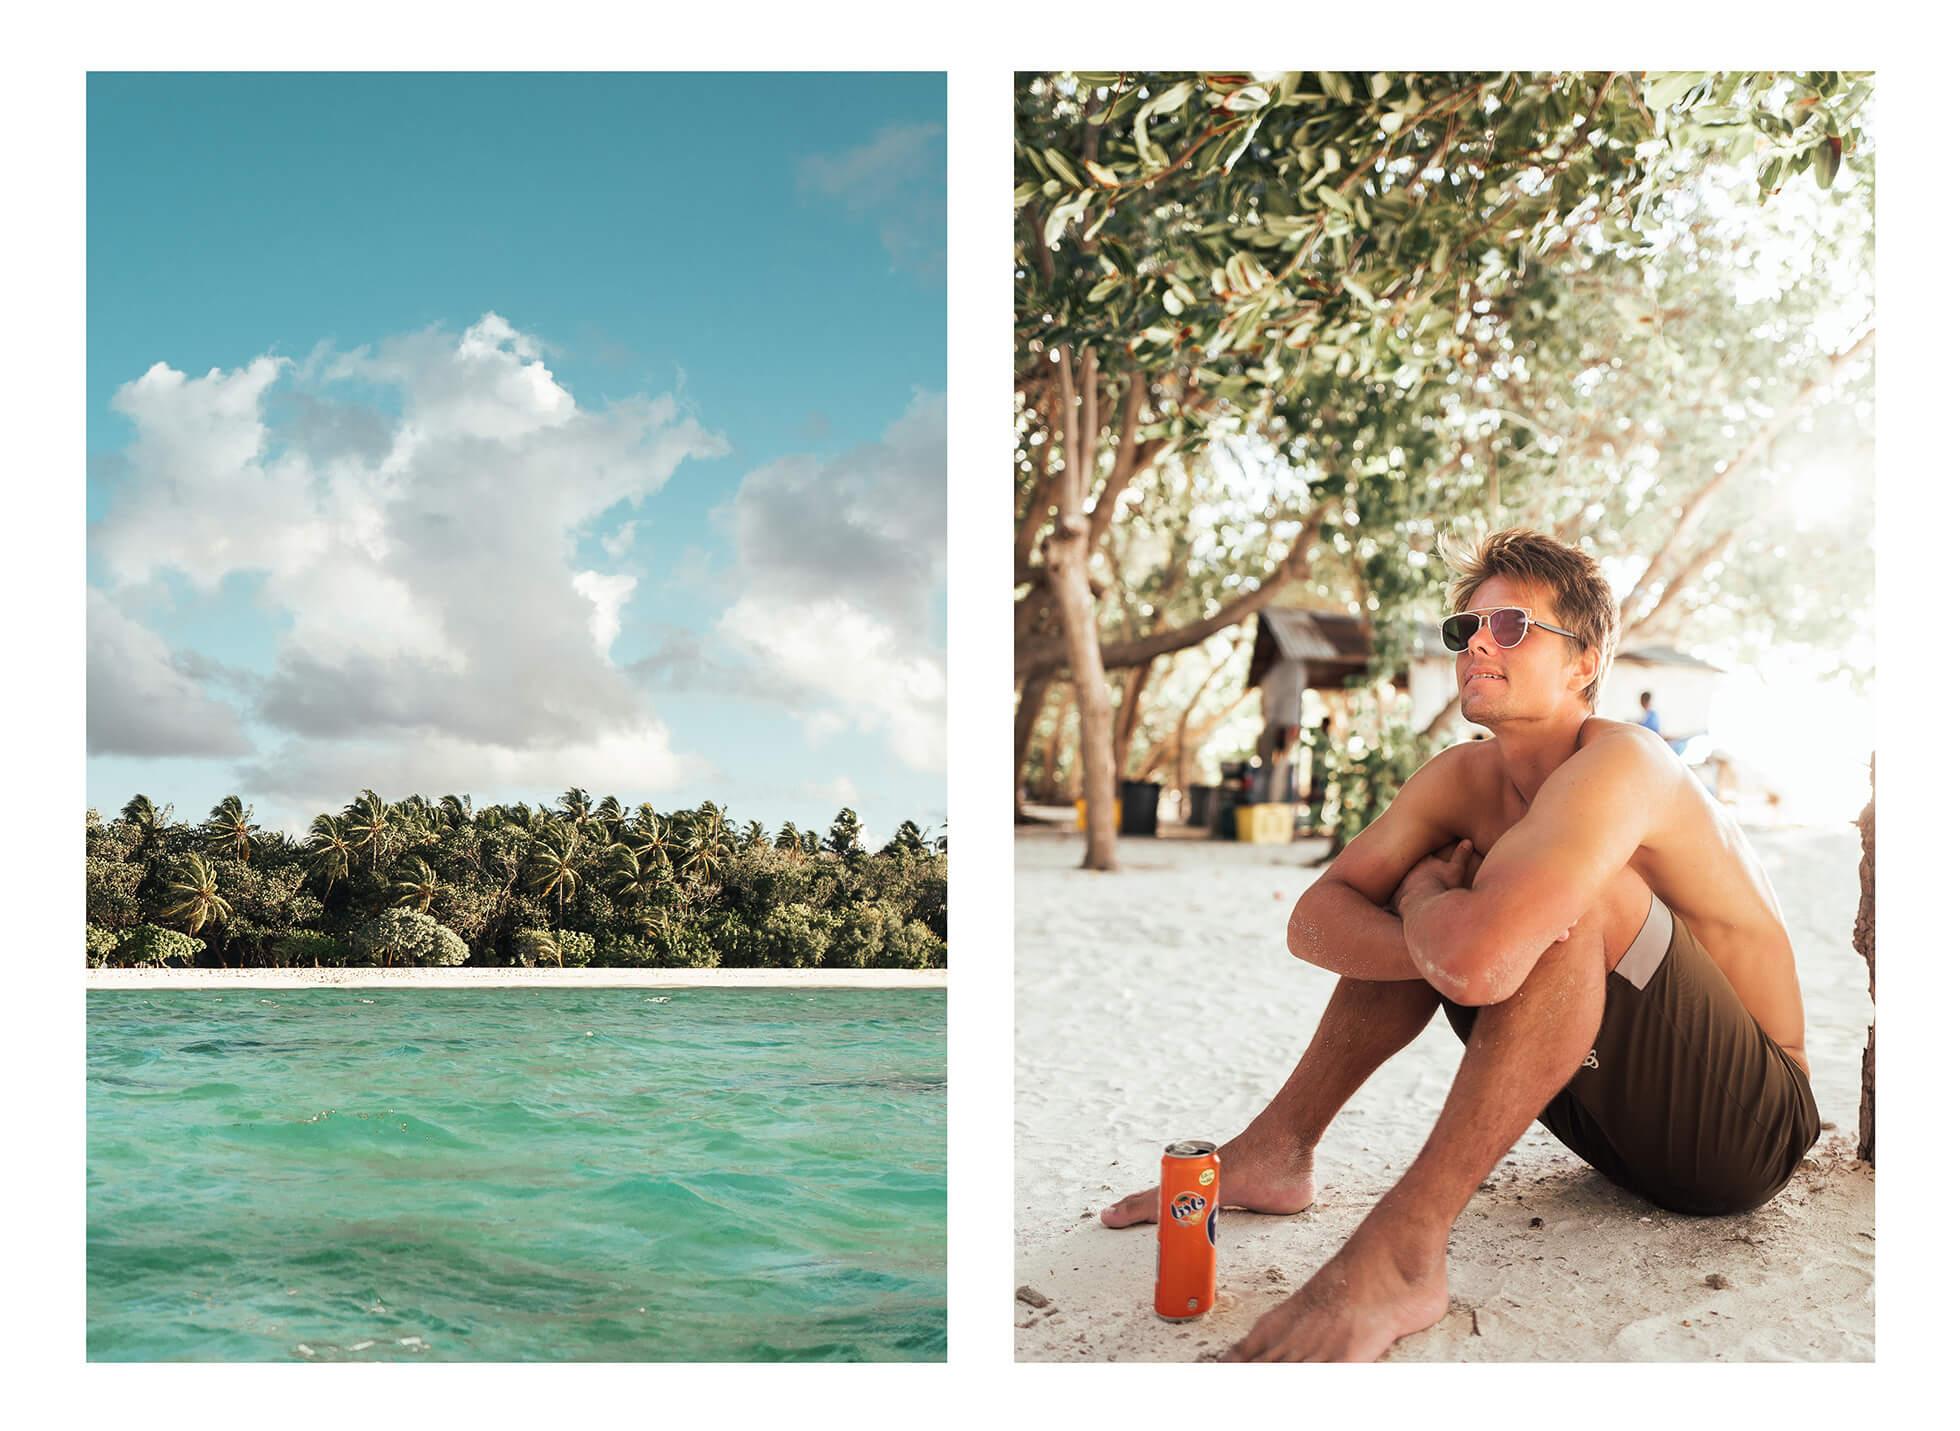 janni-deler-island-hopping-maldivesl1130108-copy